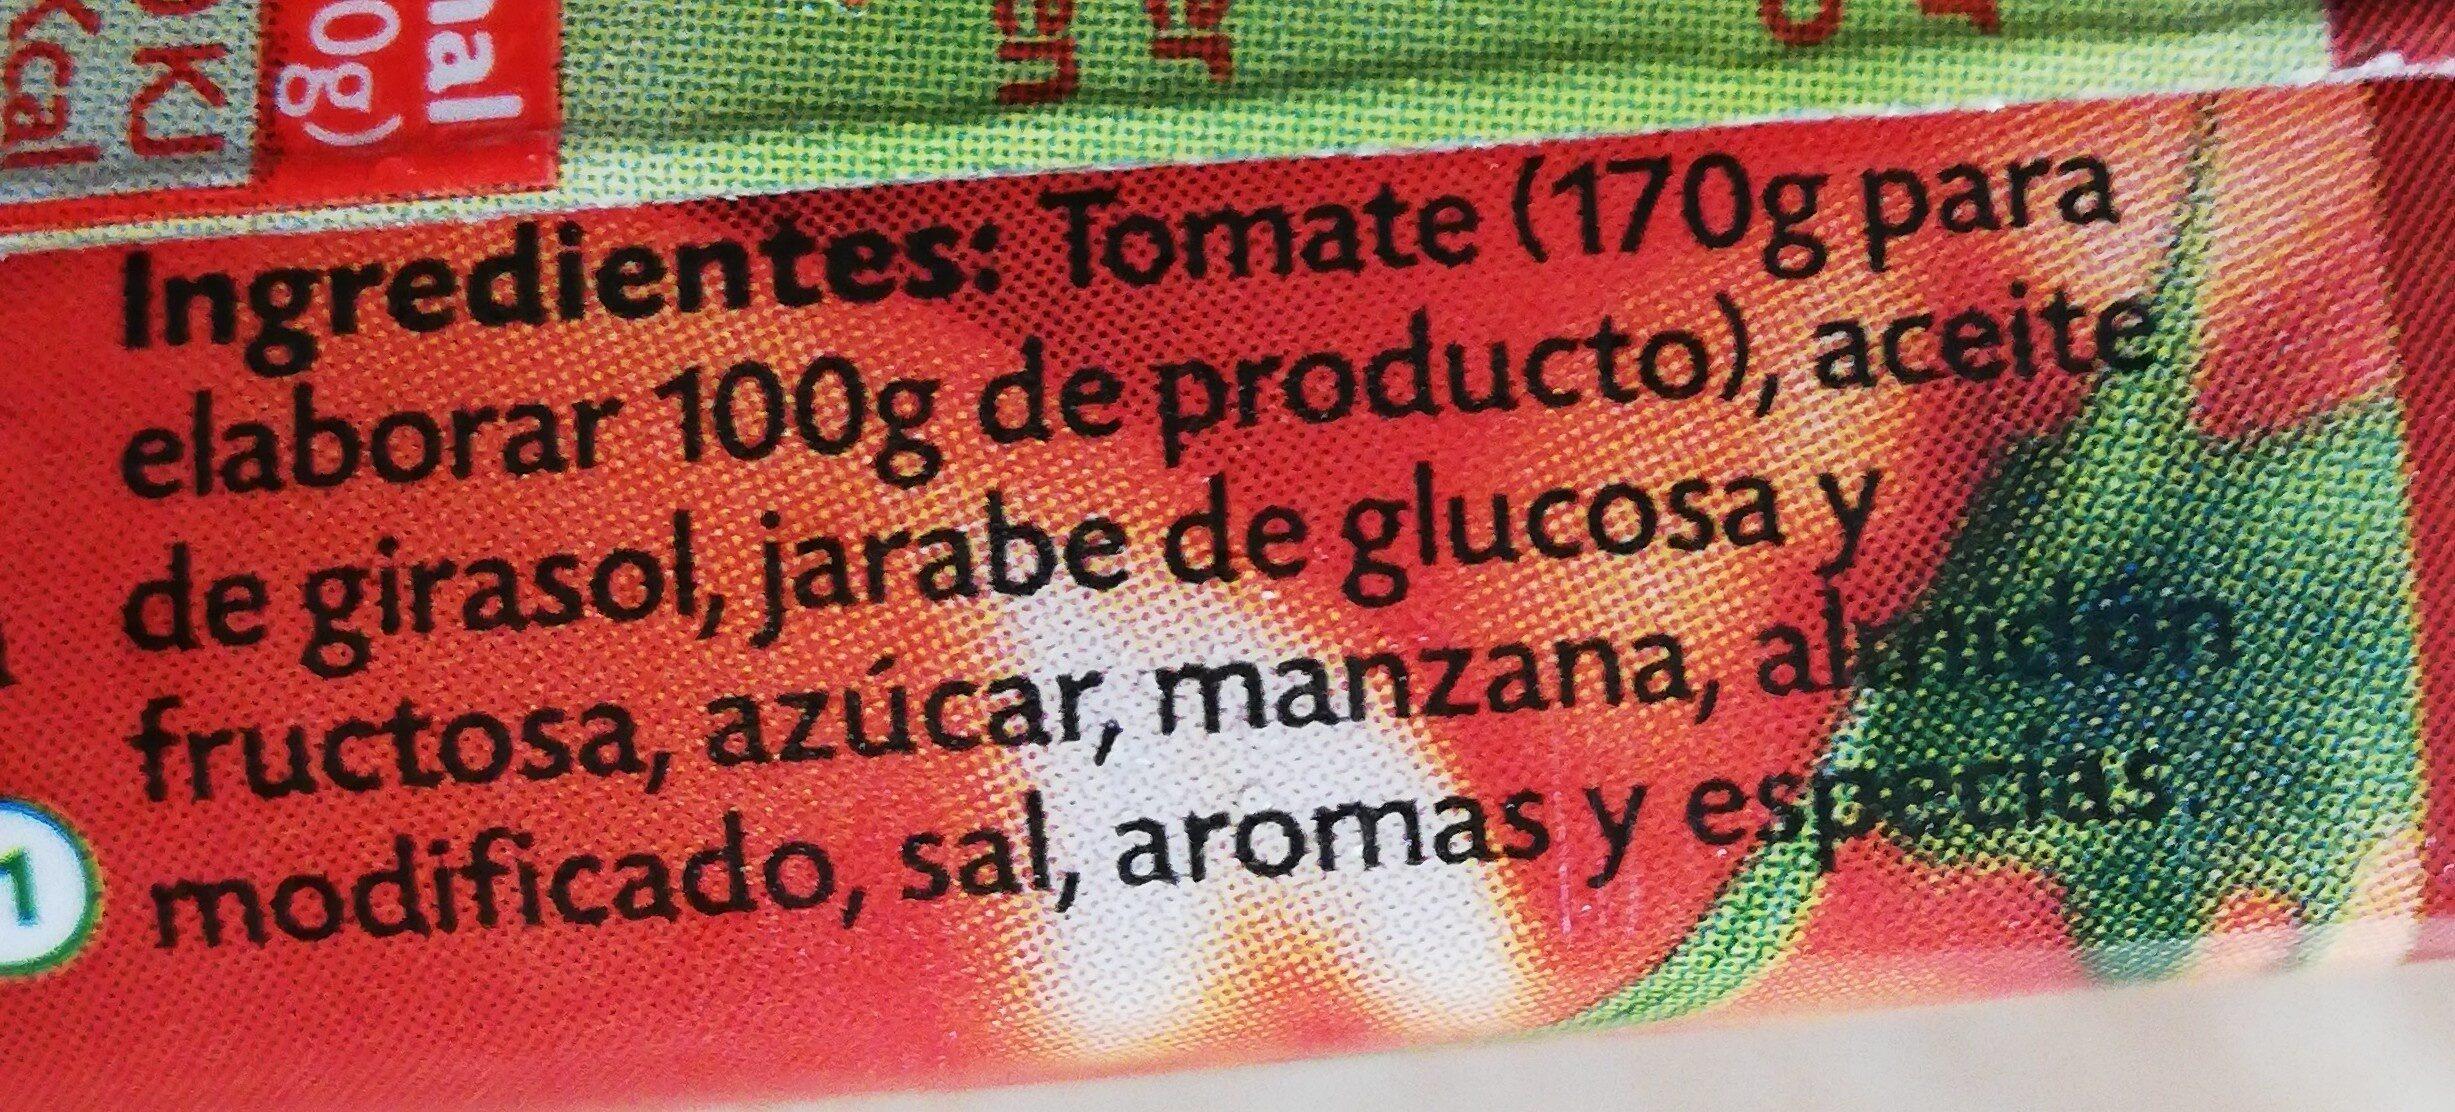 Tomate frito - Ingredientes - es